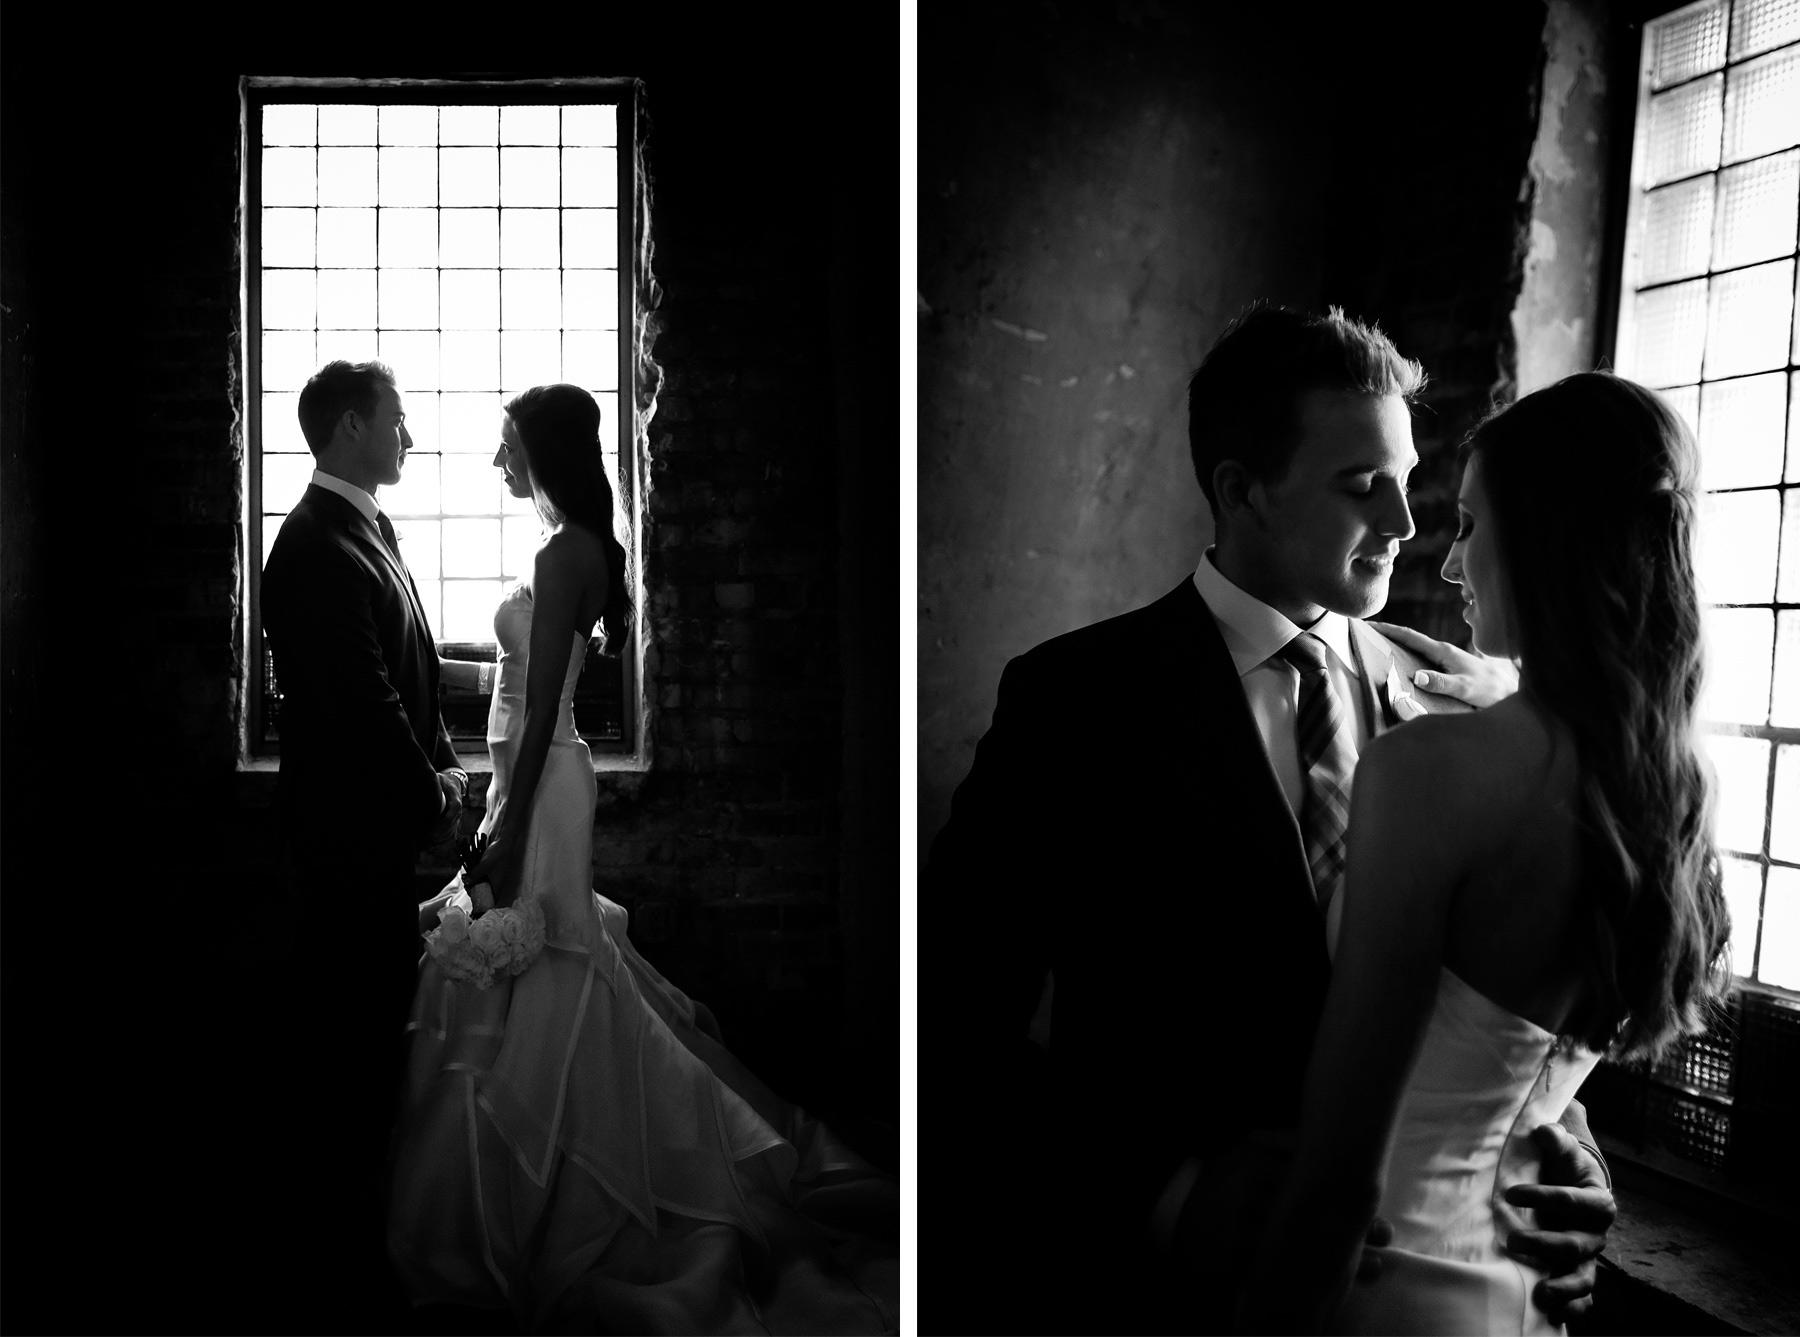 04-Minneapolis-Minnesota-Wedding-Photography-by-Vick-Photography-Aria-First-Look-Katie-&-Joe.jpg